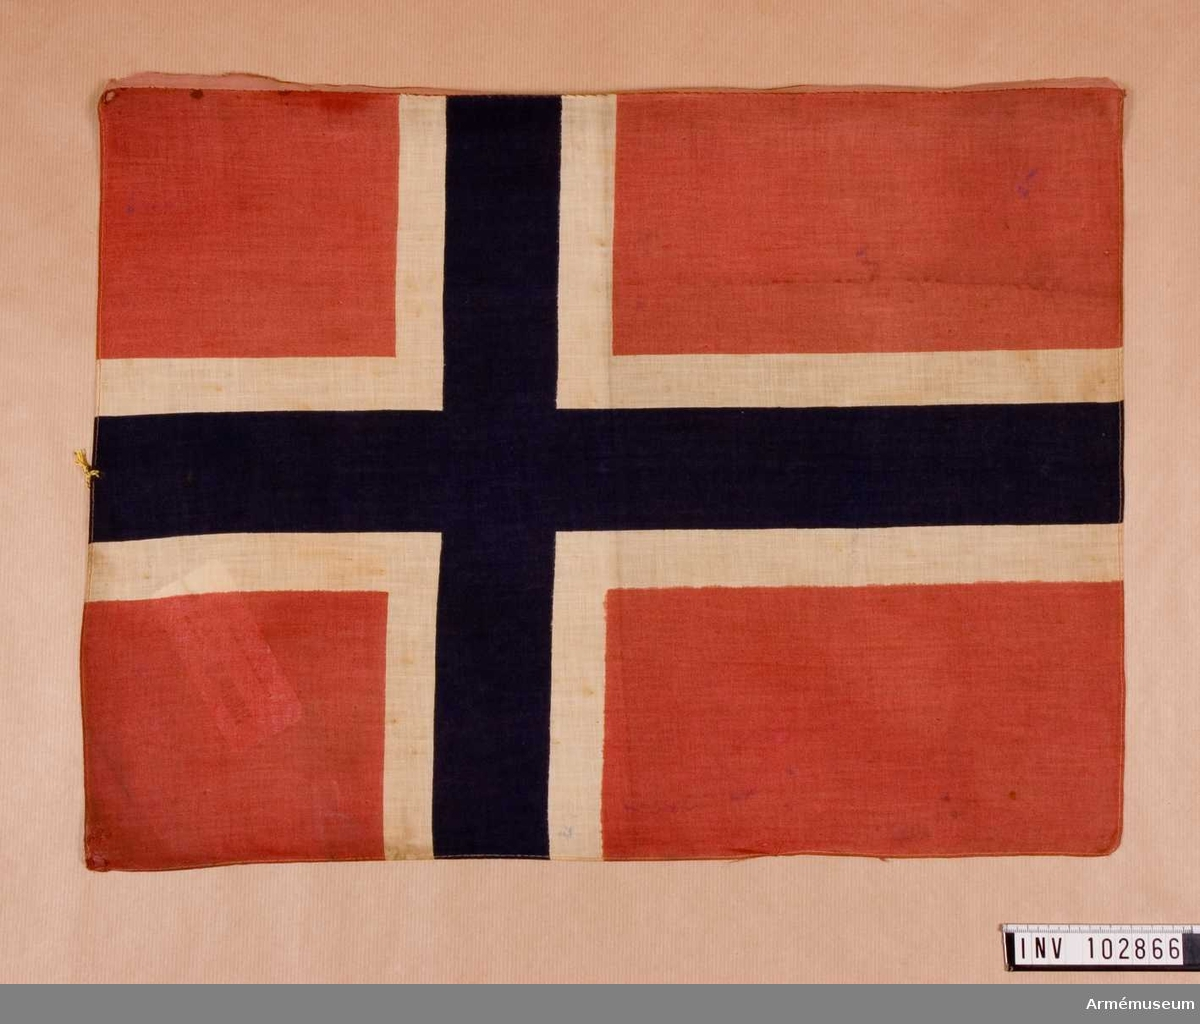 Grupp B I. Norsk flagga, 50x36,5 cm, målad på vit duk.